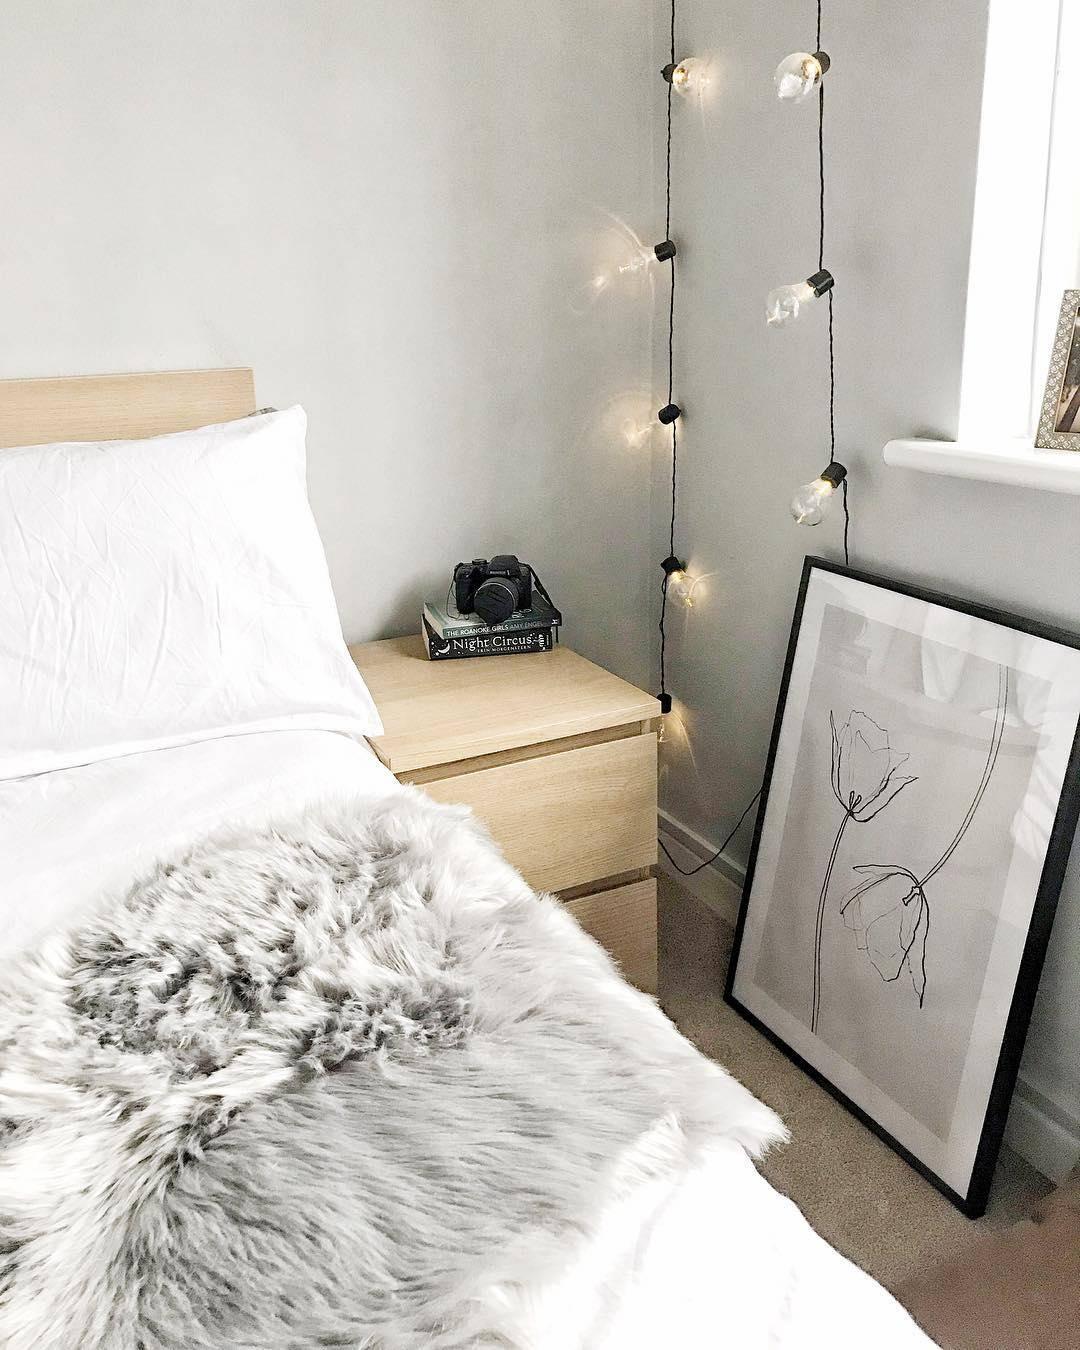 Enjoyable 75 Wall Decor Ideas For An Insta Worthy Home Arthaus Download Free Architecture Designs Rallybritishbridgeorg